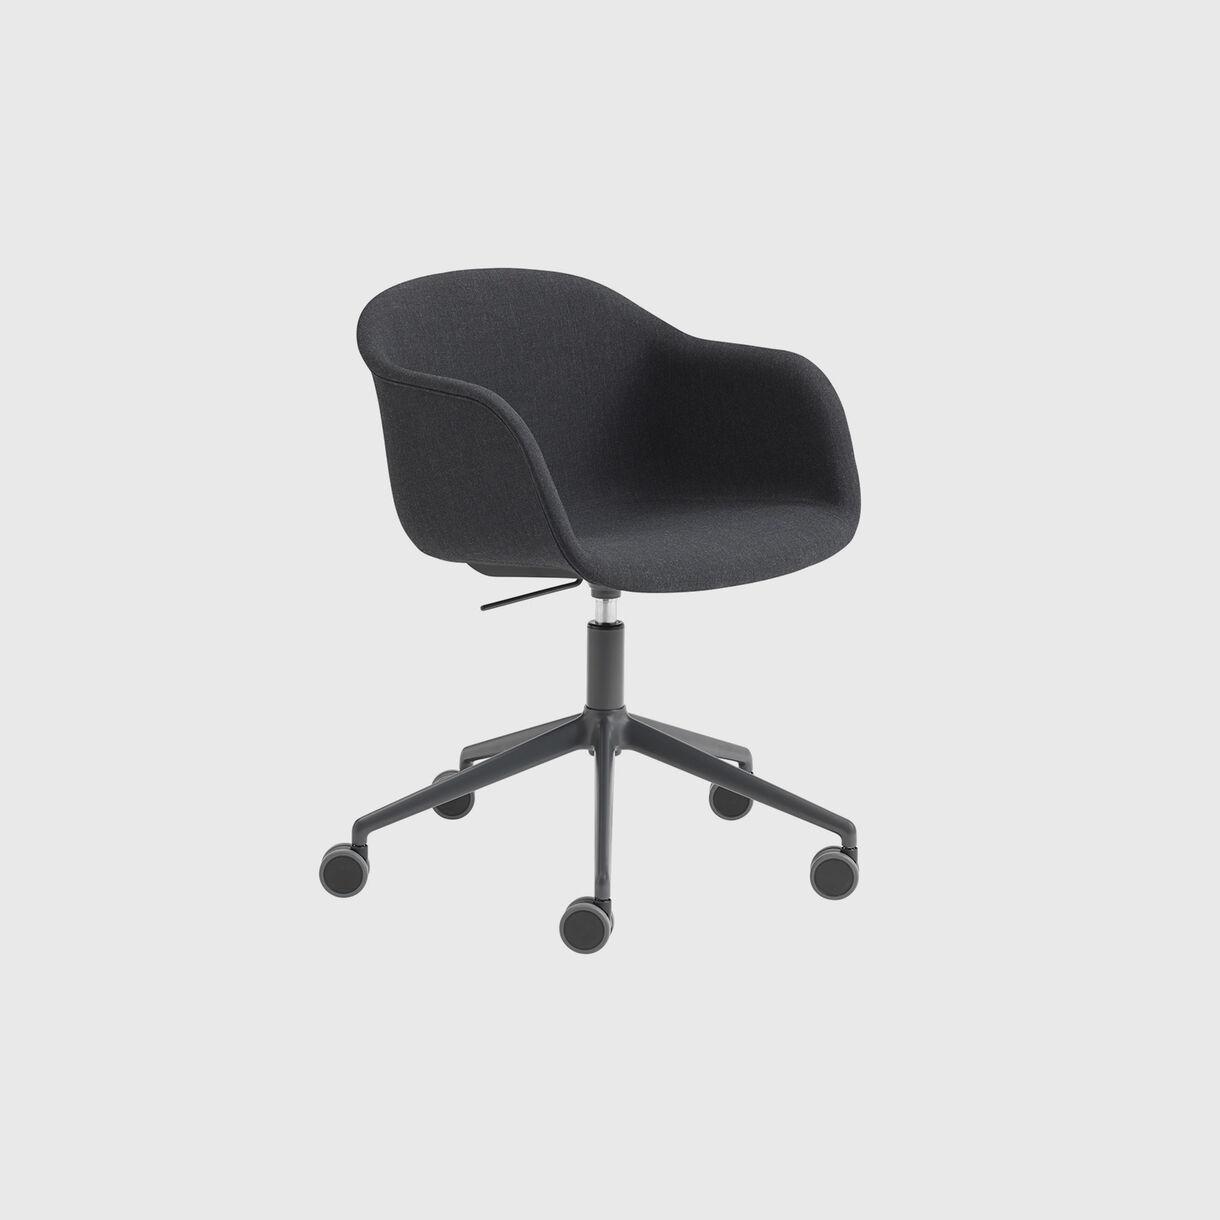 Fiber Armchair Upholstered, Remix 183 & Black, Swivel Base with Castors & Gas Lift, Grey